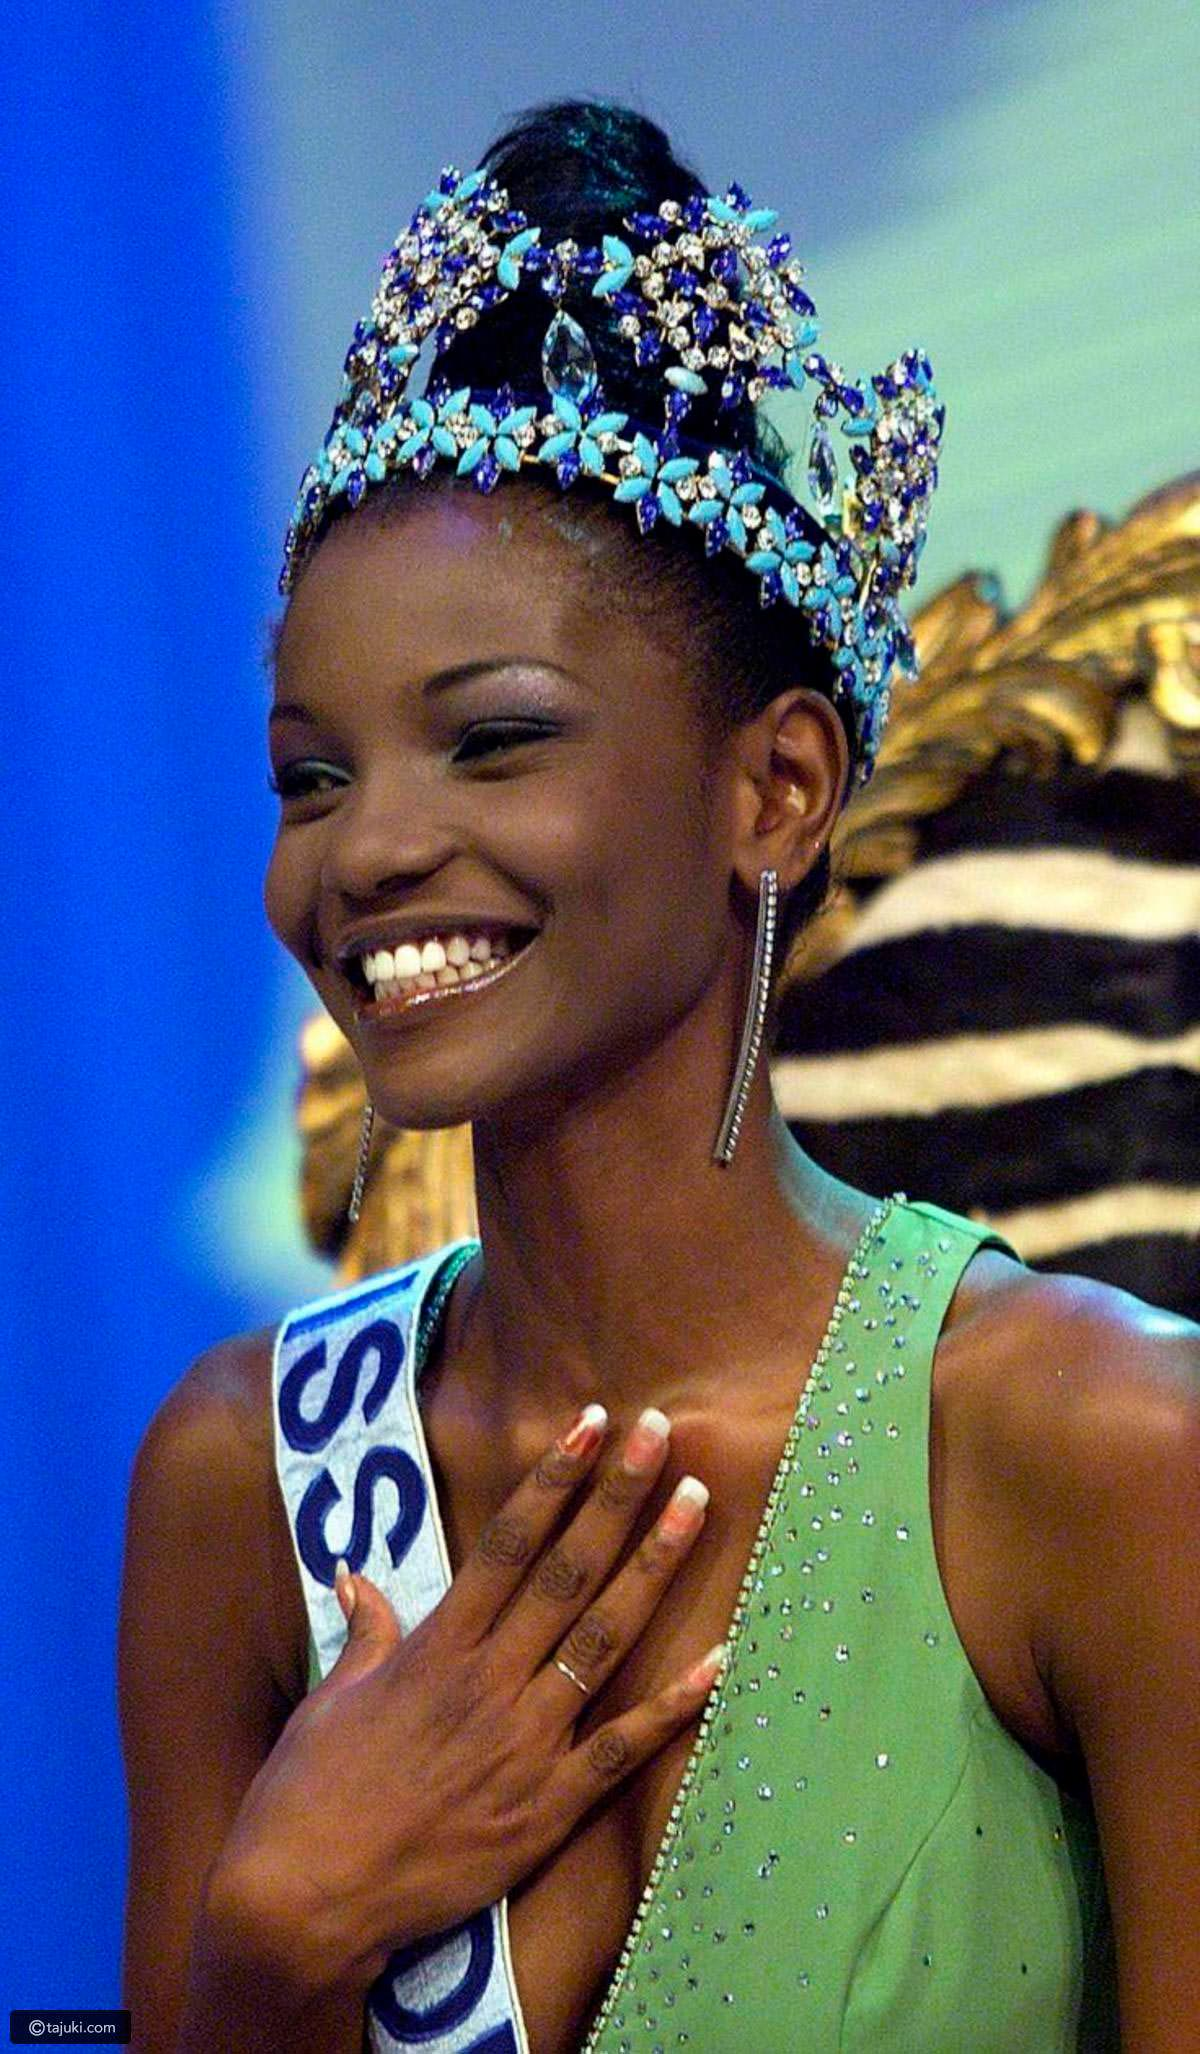 Фото   Мисс Мира 2001 года Агбани Дарего